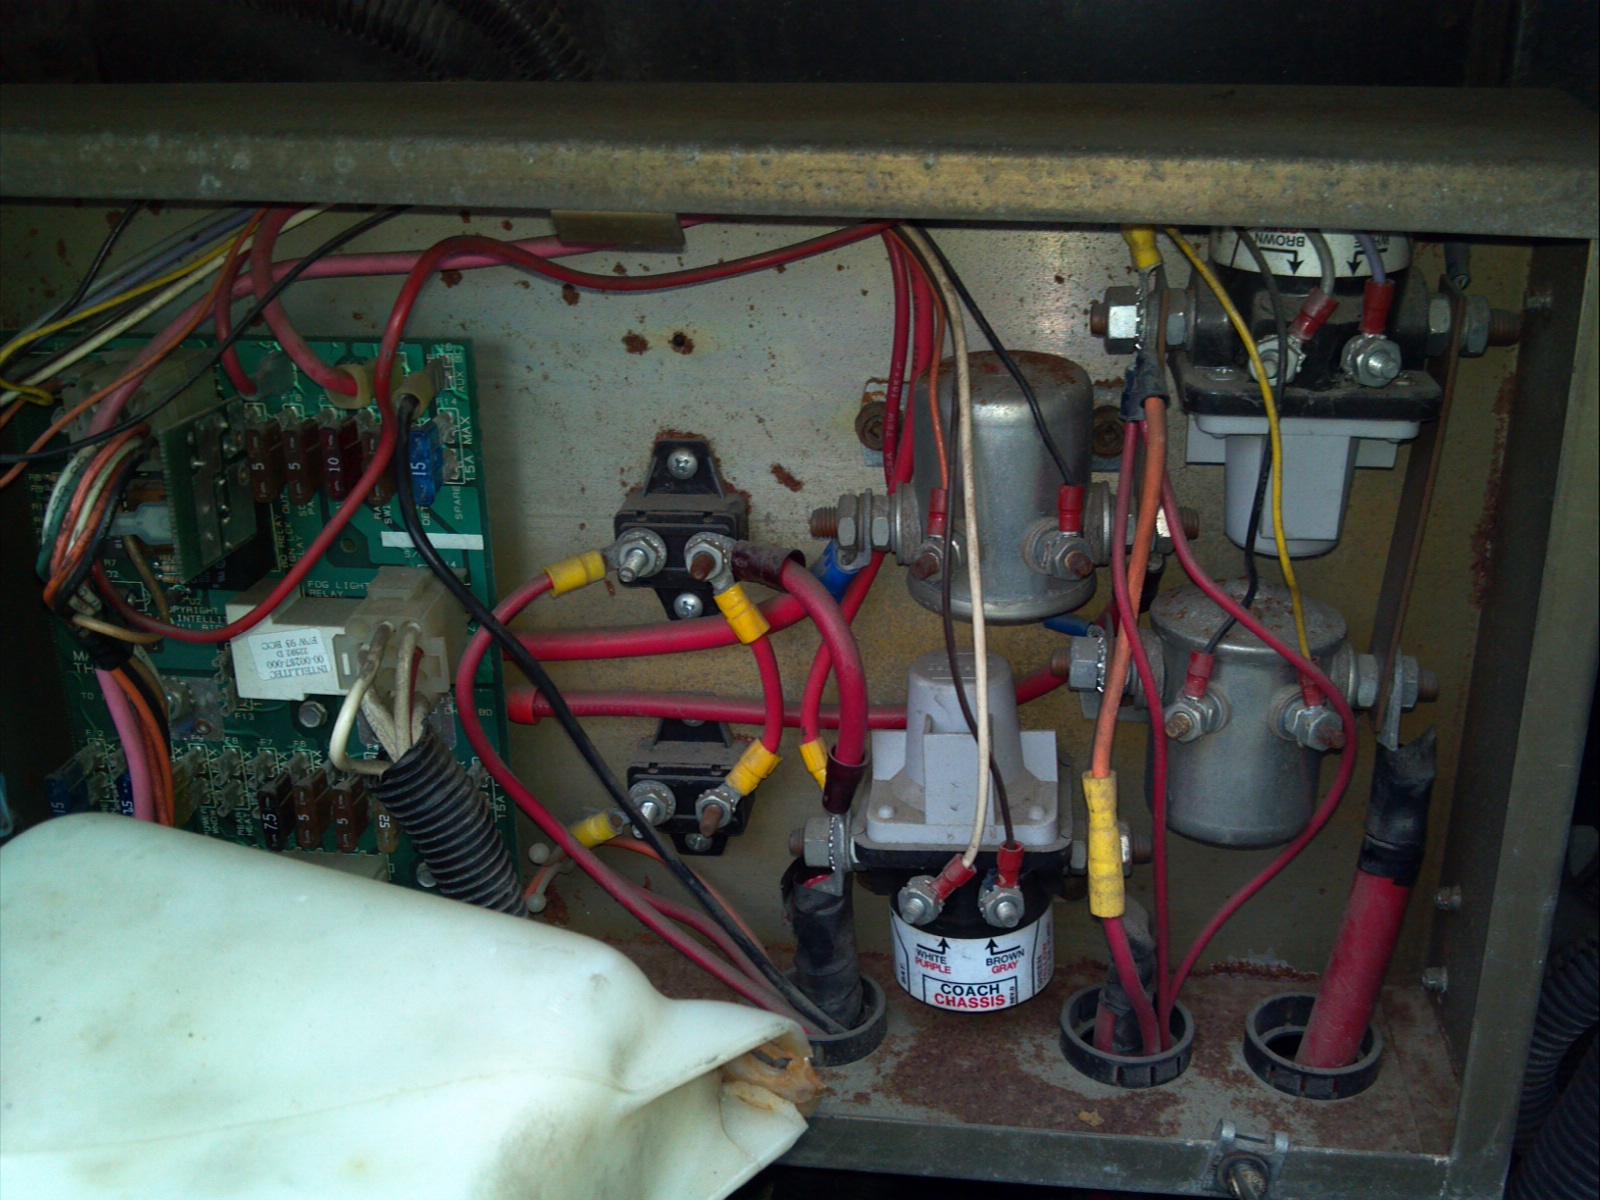 1993 fleetwood prowler wiring diagram jayco eagle wiring